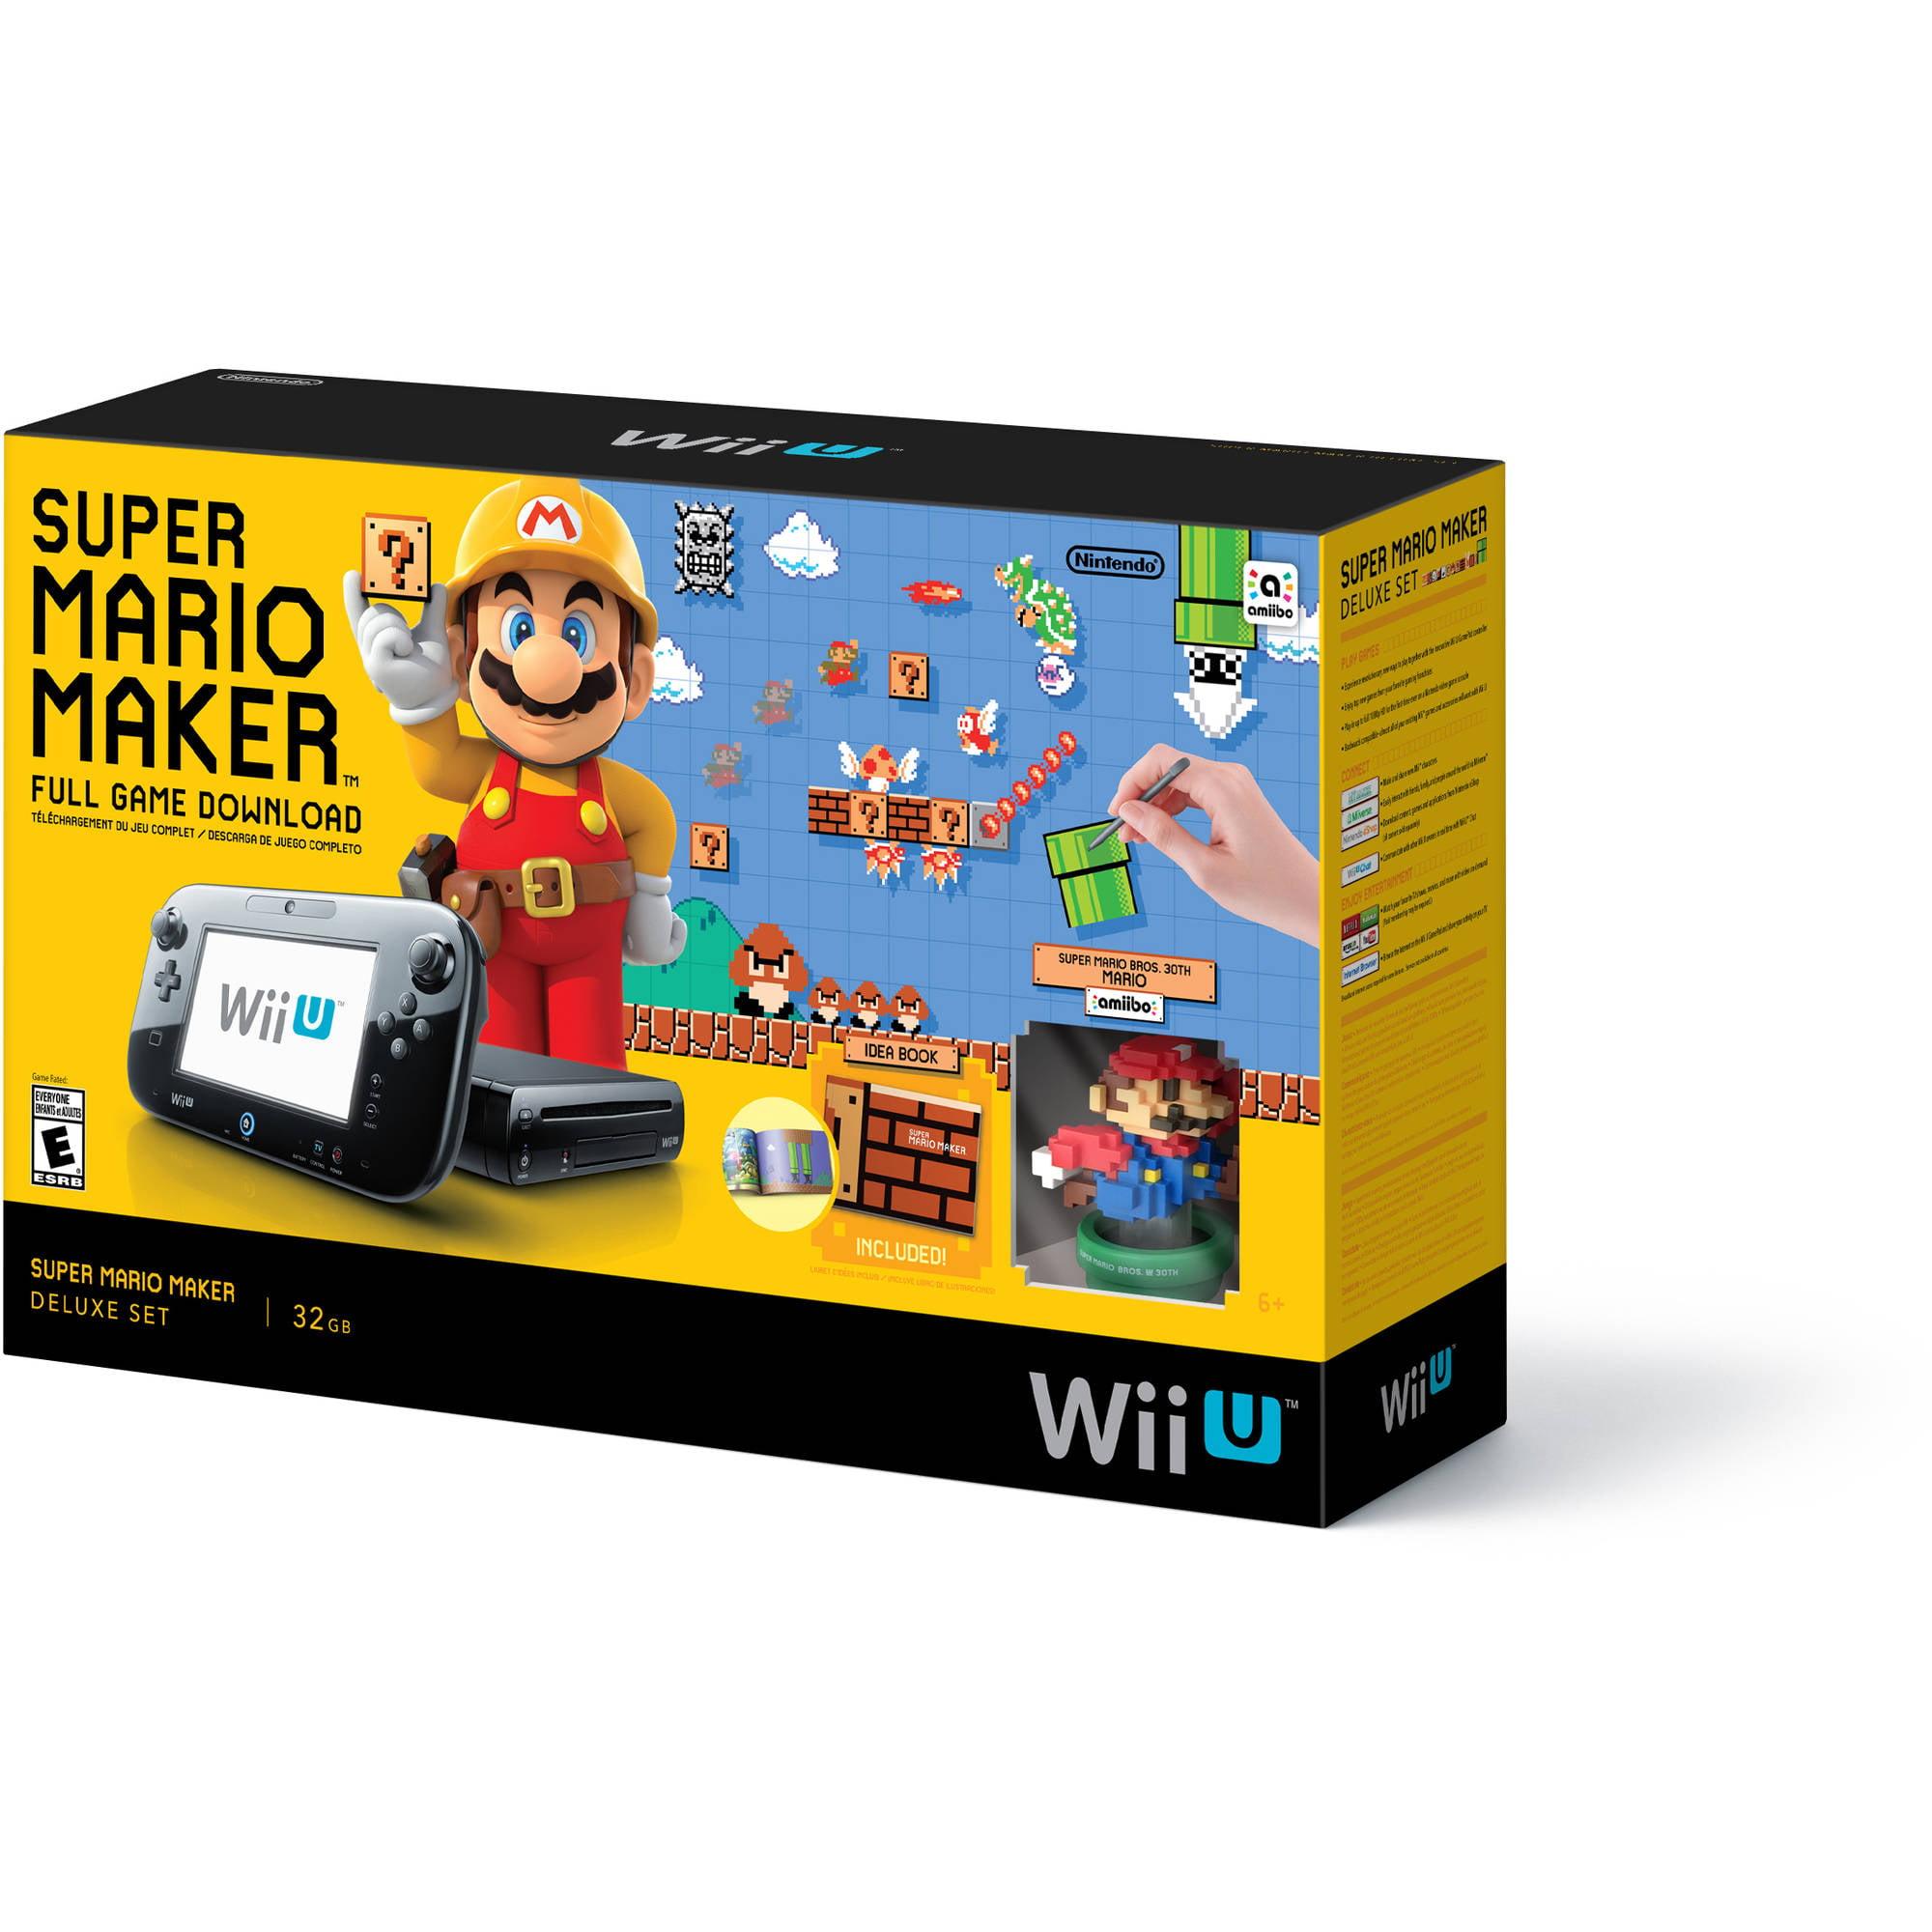 Nintendo Wii U Super Mario Maker Console Deluxe Set - Walmart Exclusive